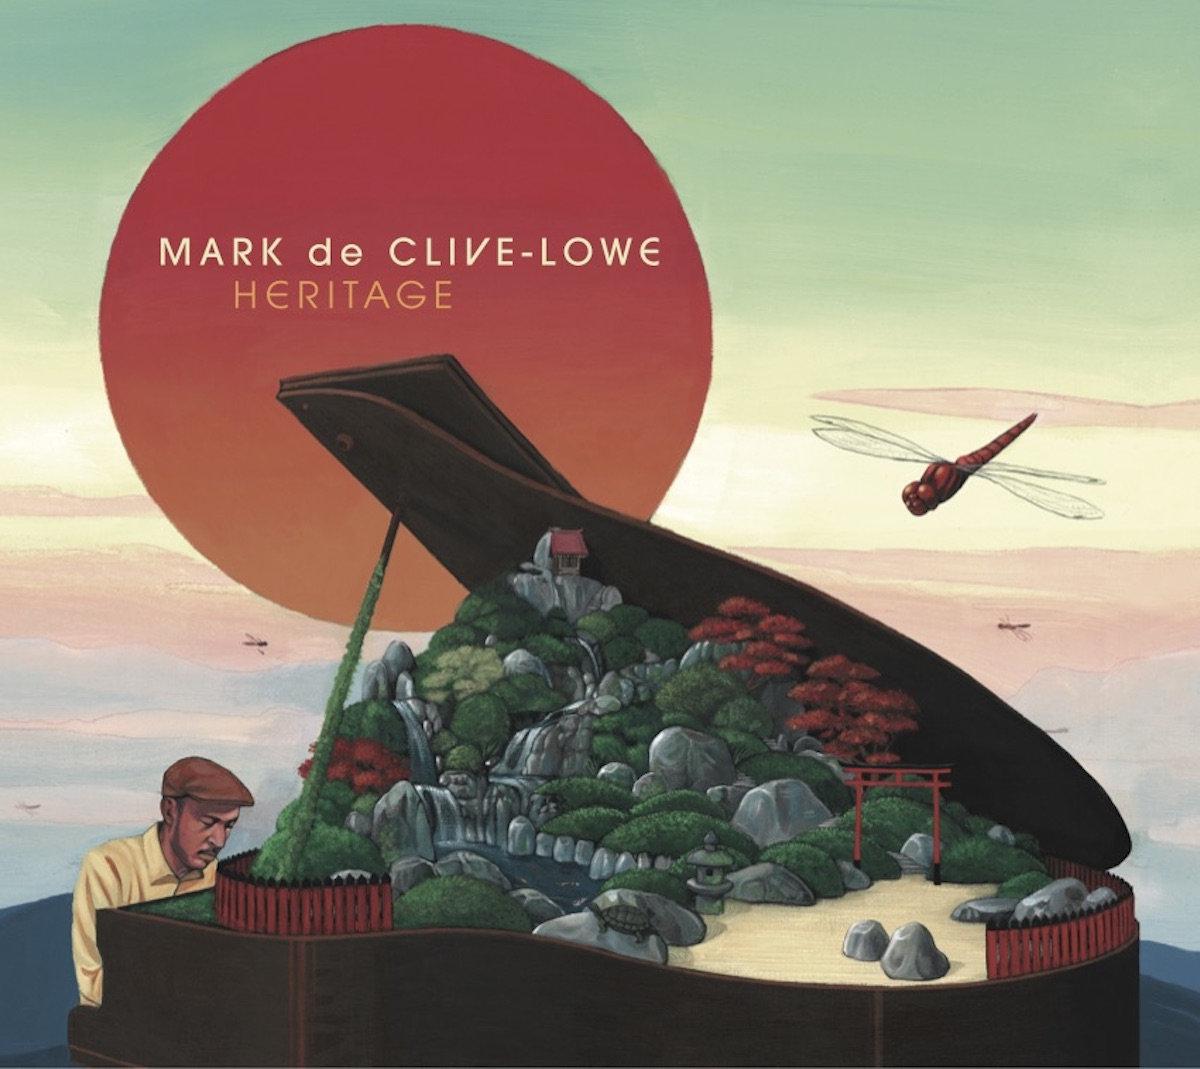 Heritage | Mark de Clive-Lowe